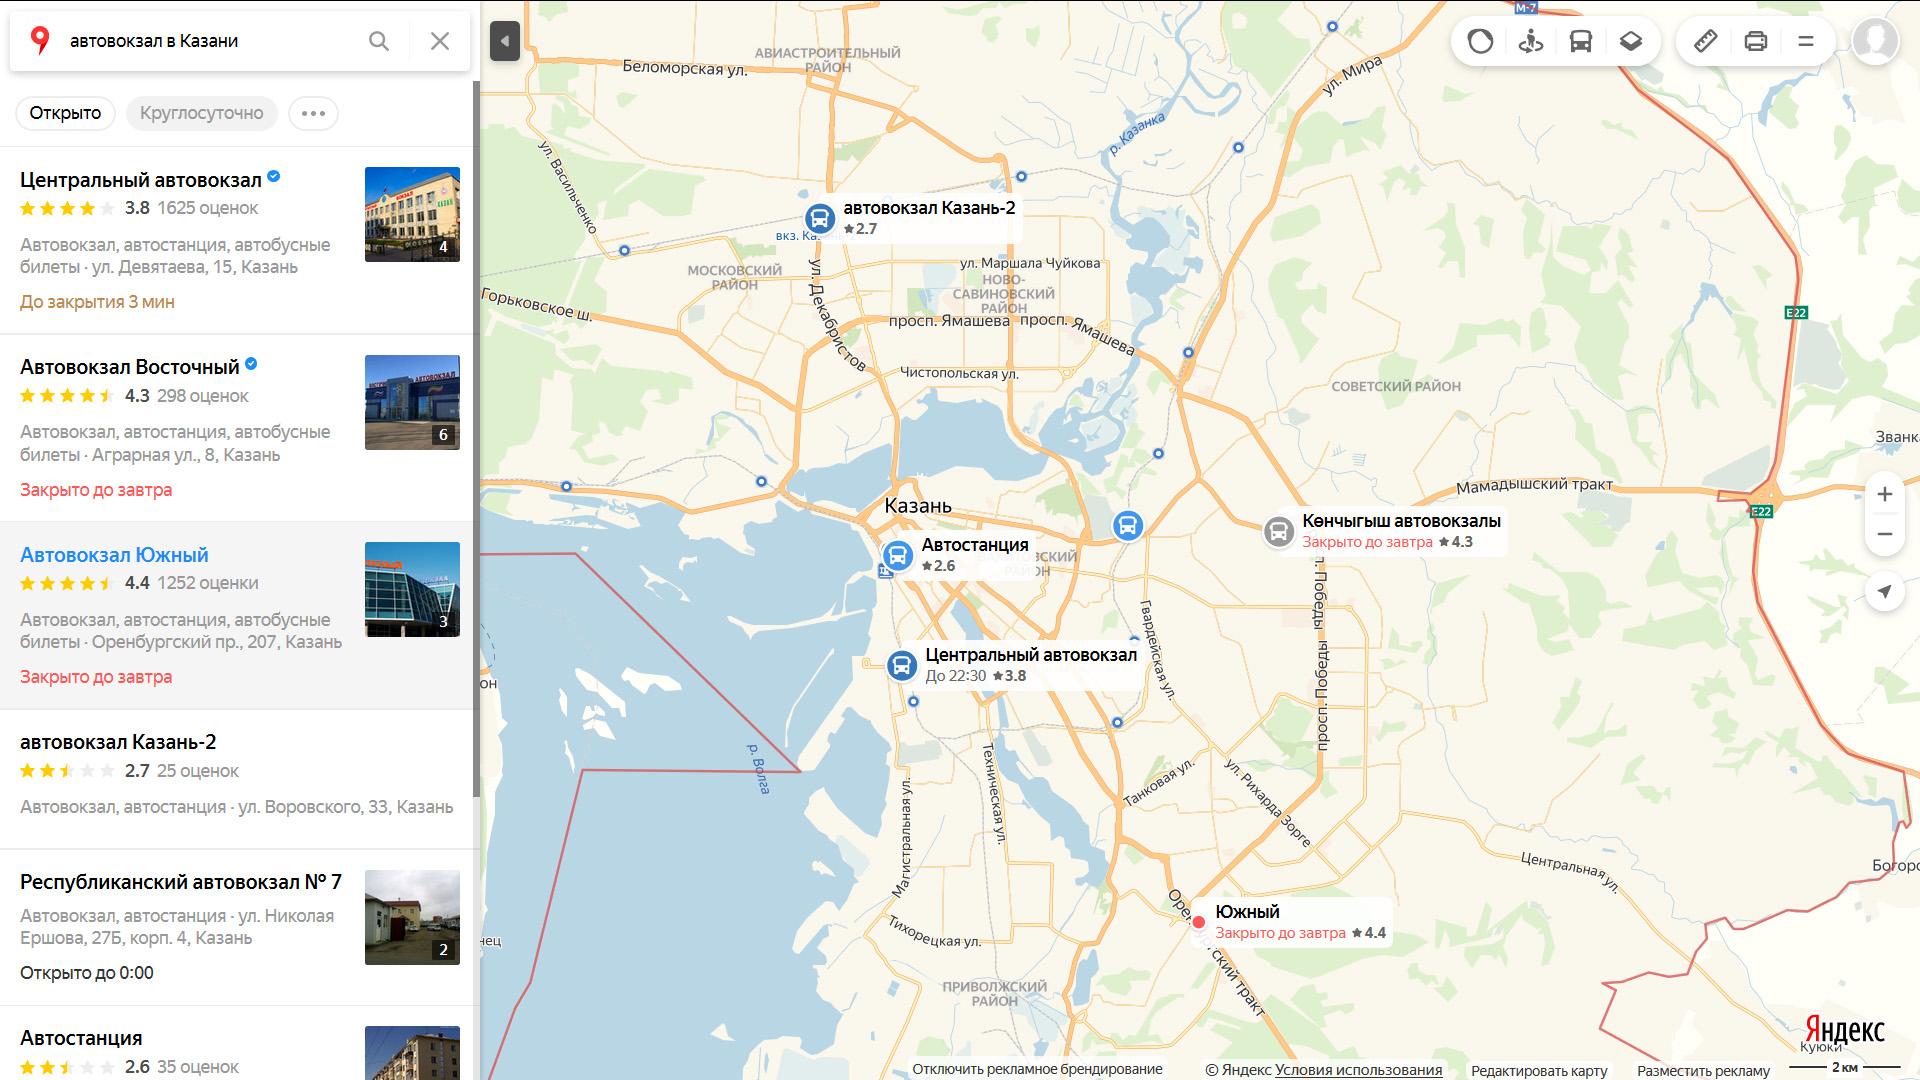 Автовокзалы Казани на карте